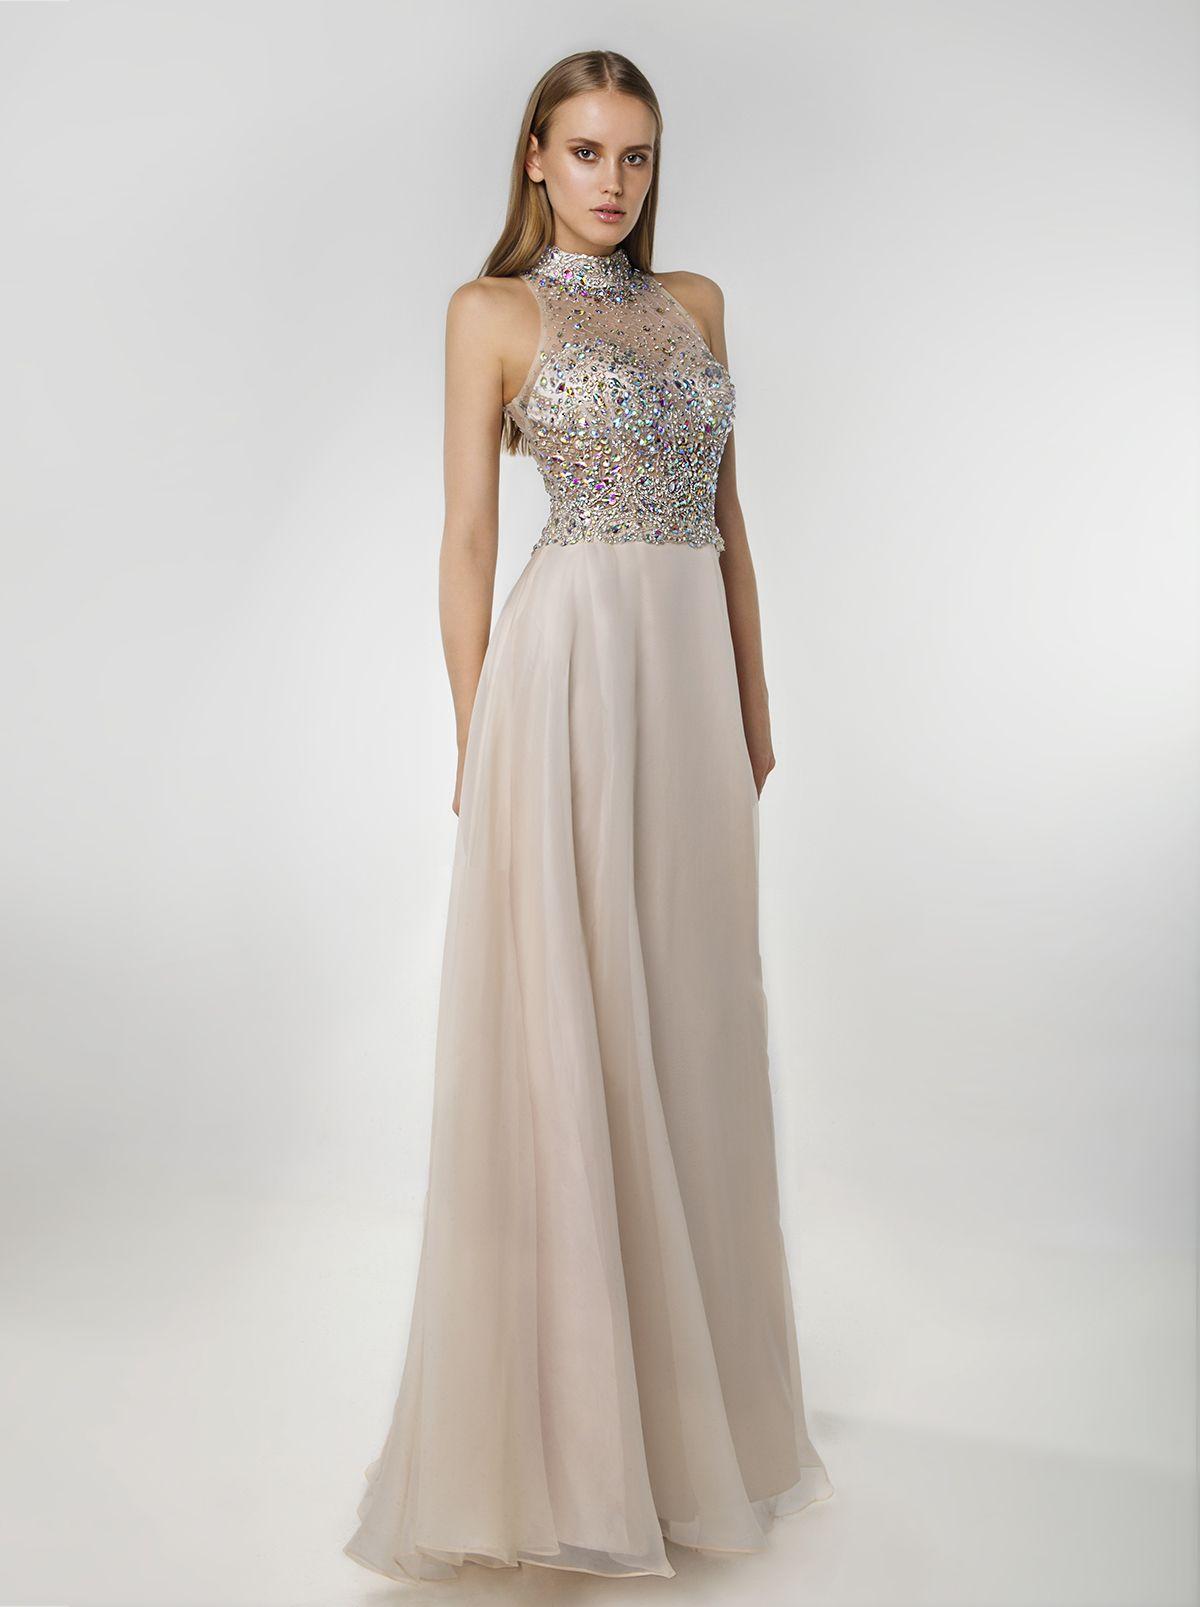 54788464438c Pin από το χρήστη Mikael Evening Dresses στον πίνακα Evening Dresses ...